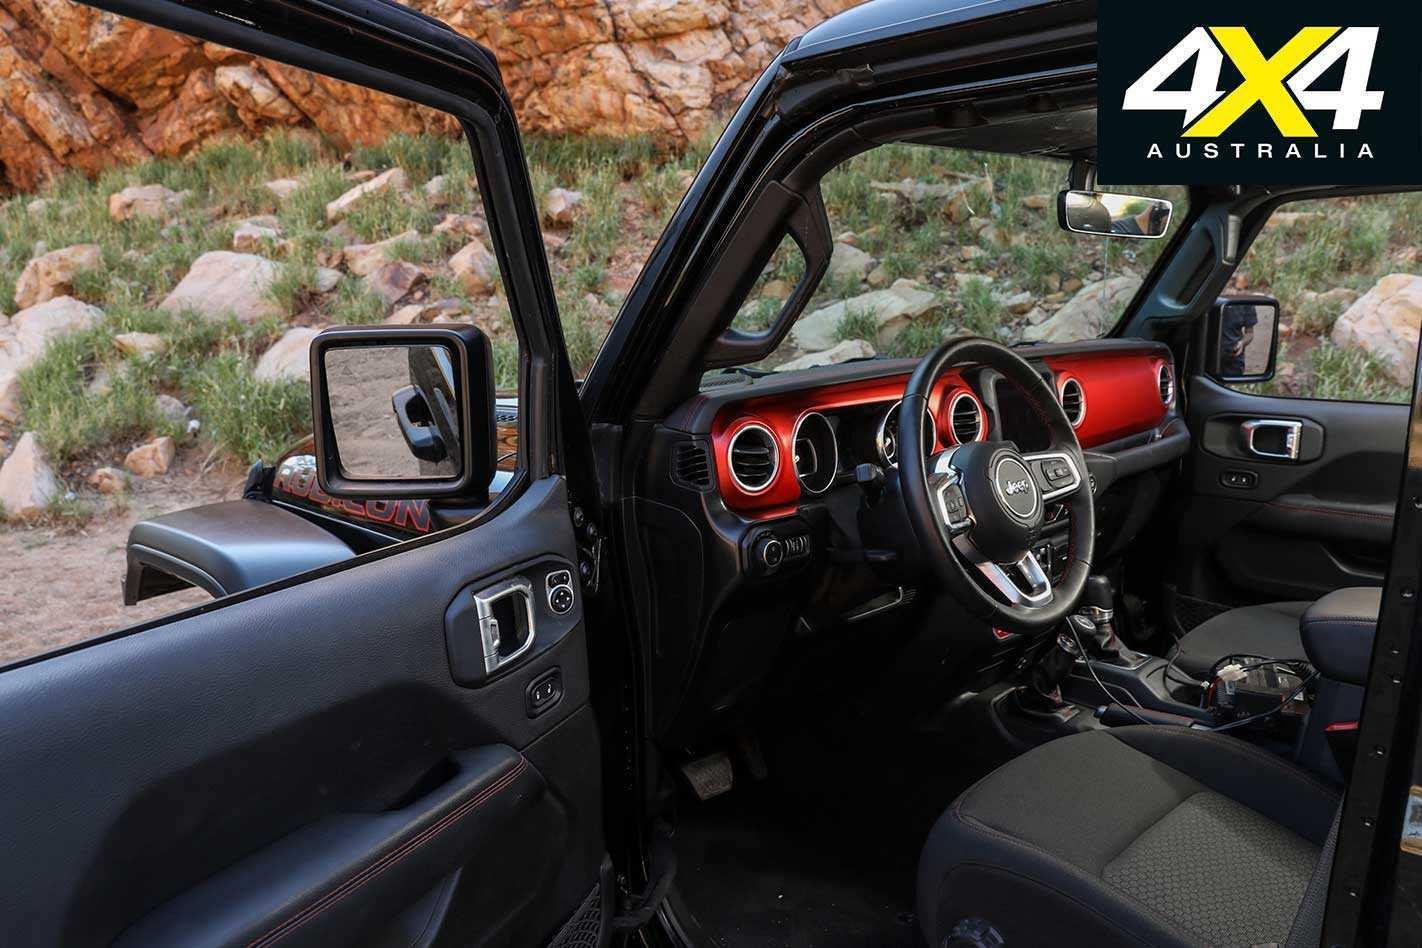 20 Great Jeep Turbo Diesel 2019 Interior Spesification with Jeep Turbo Diesel 2019 Interior